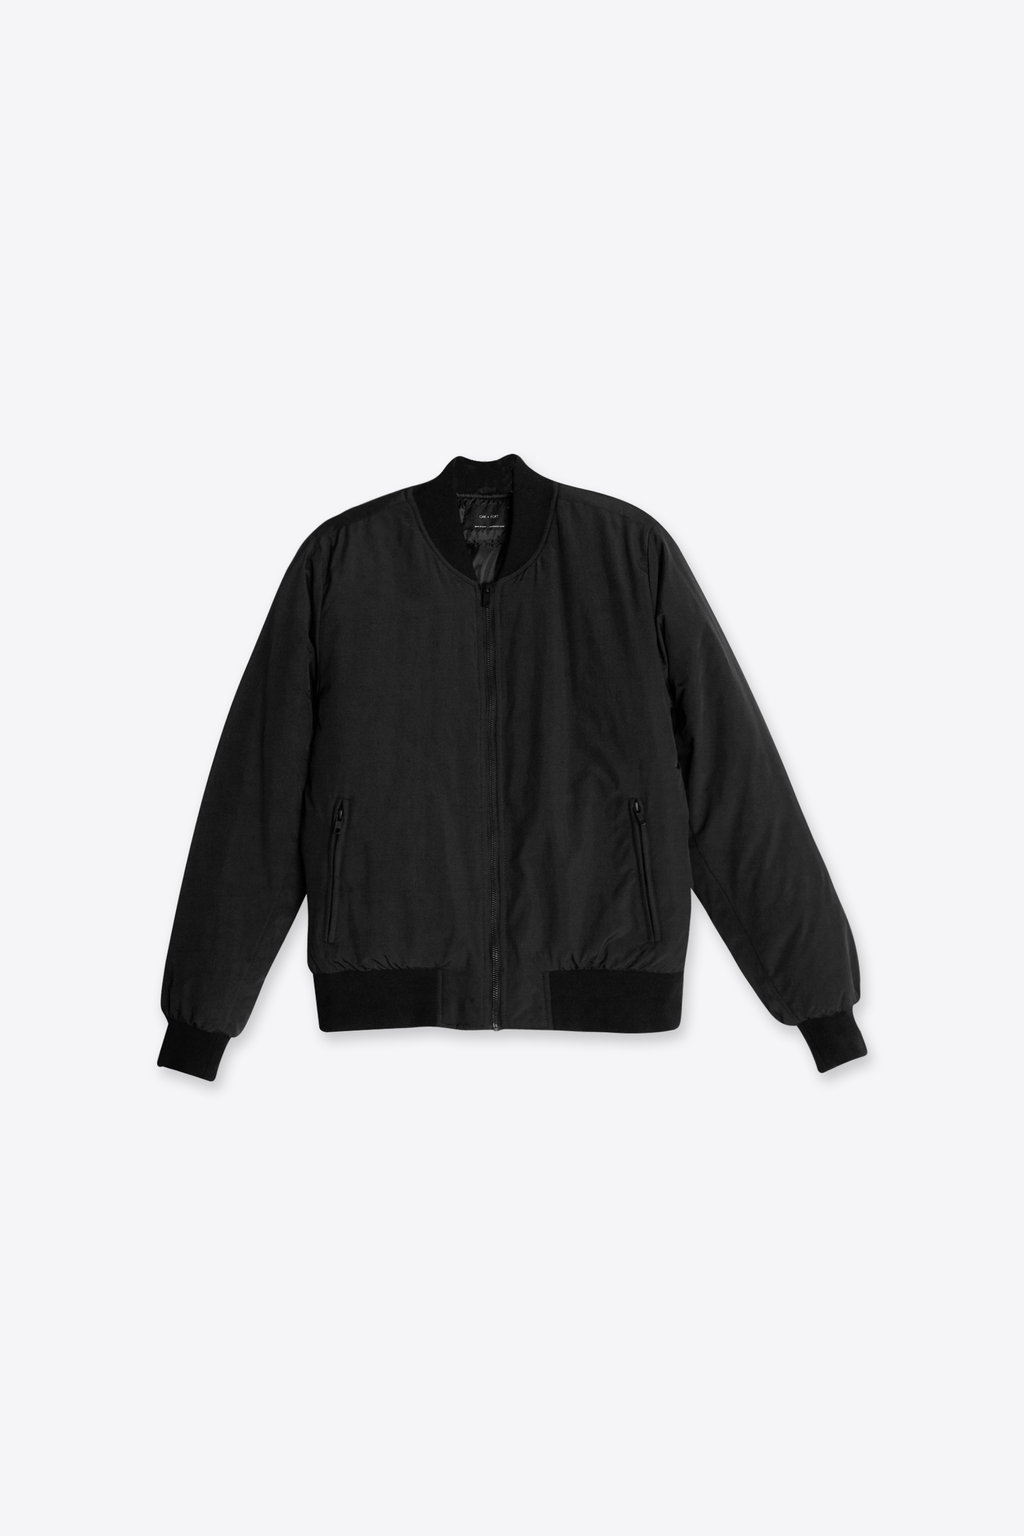 Jacket 2005 Black 5